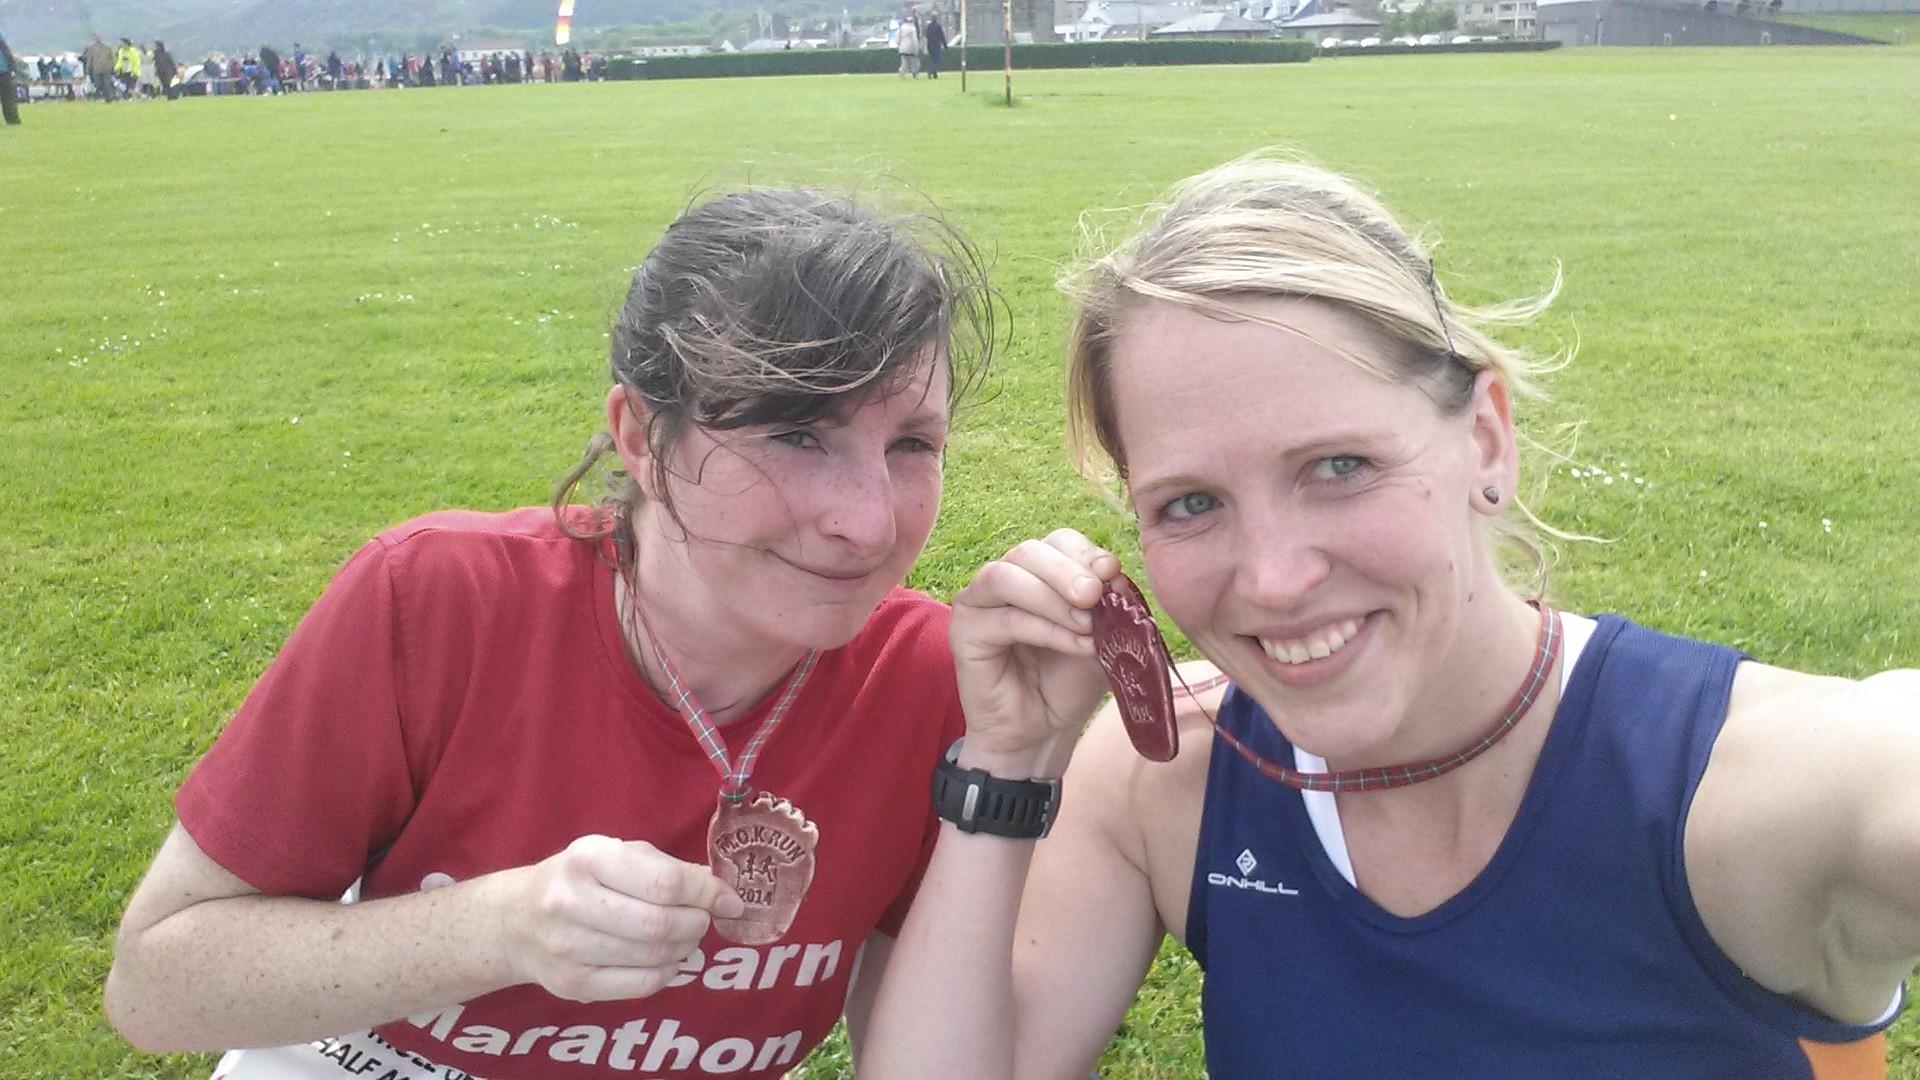 Post race sweatyness. Lovely!